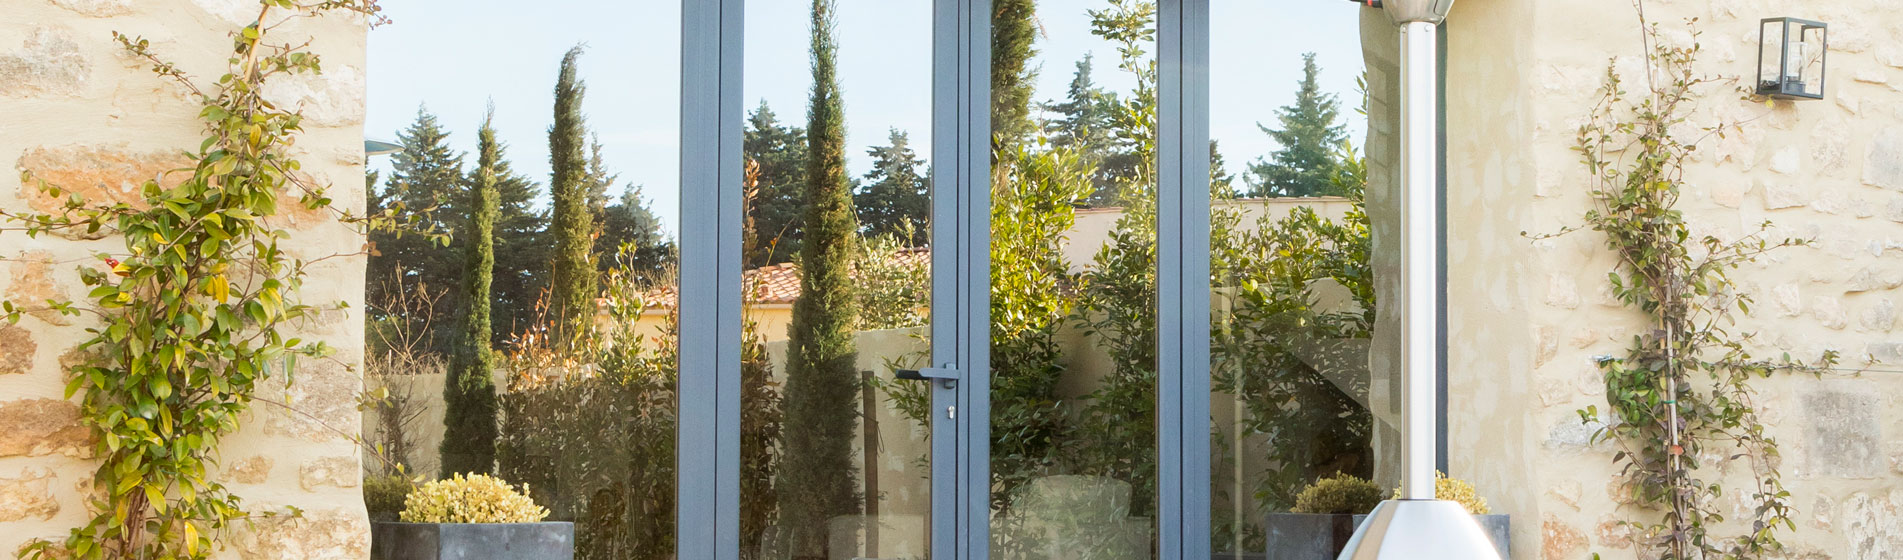 installer porte fenêtre alu 13 Bouches-du-Rhône